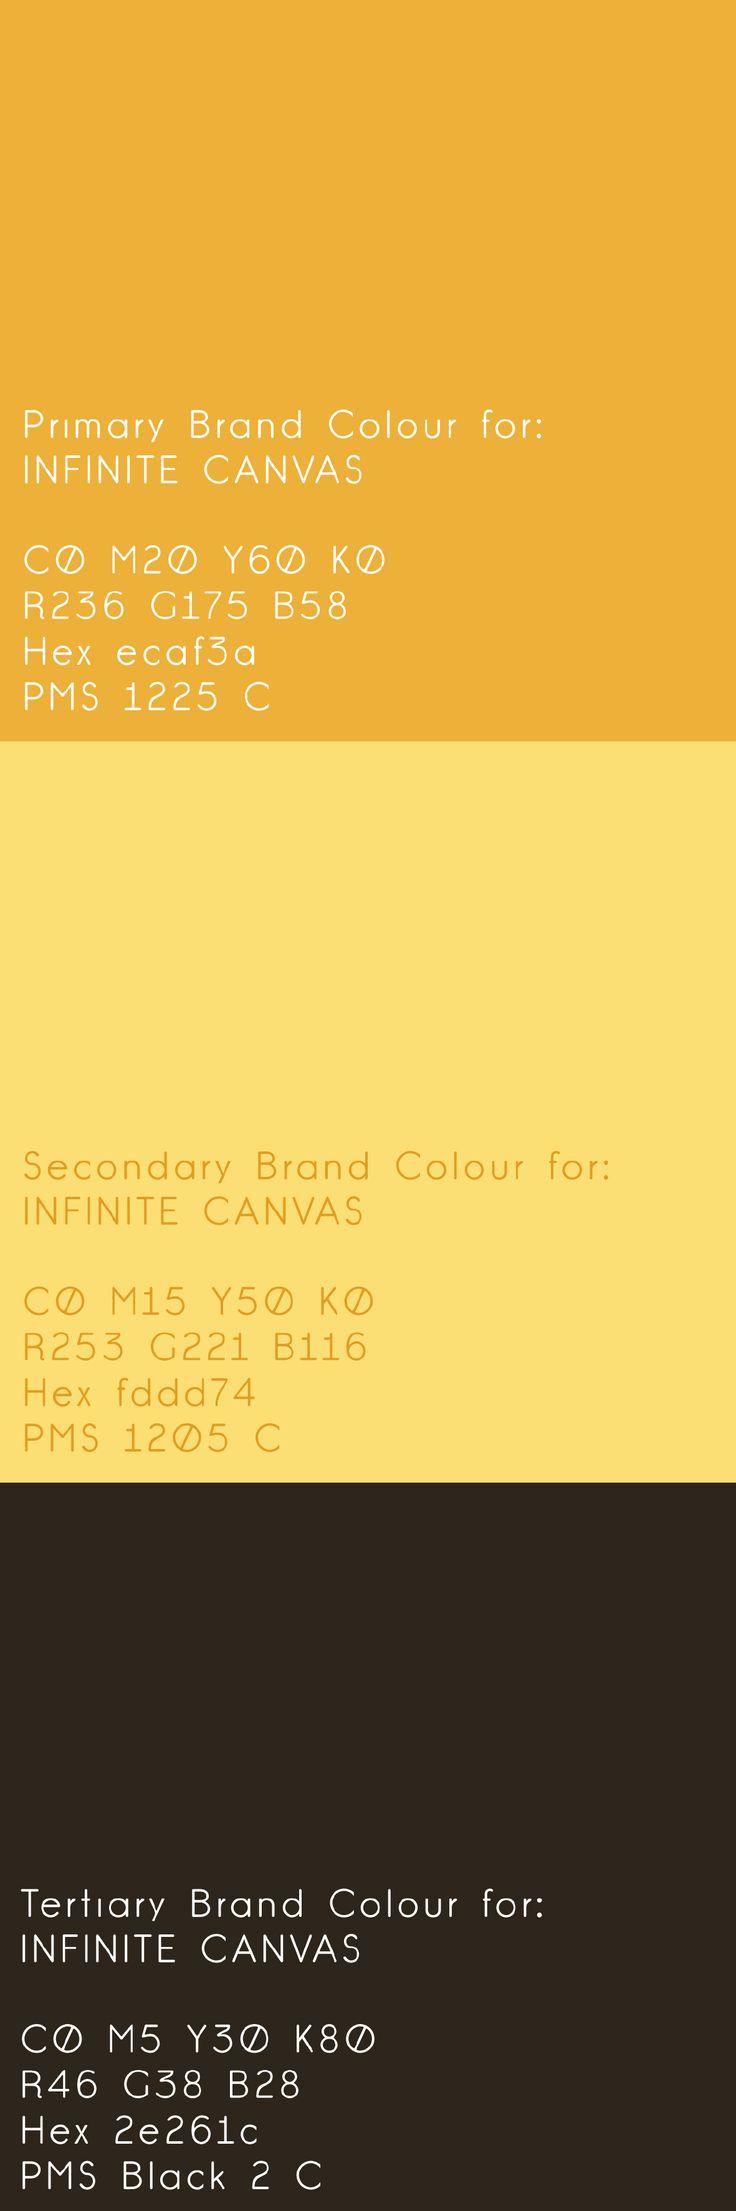 #brand development for @infinitecanvas by Inkling About Design 2014 www.inklingaboutd... #logo #branding #identity #graphicdesign